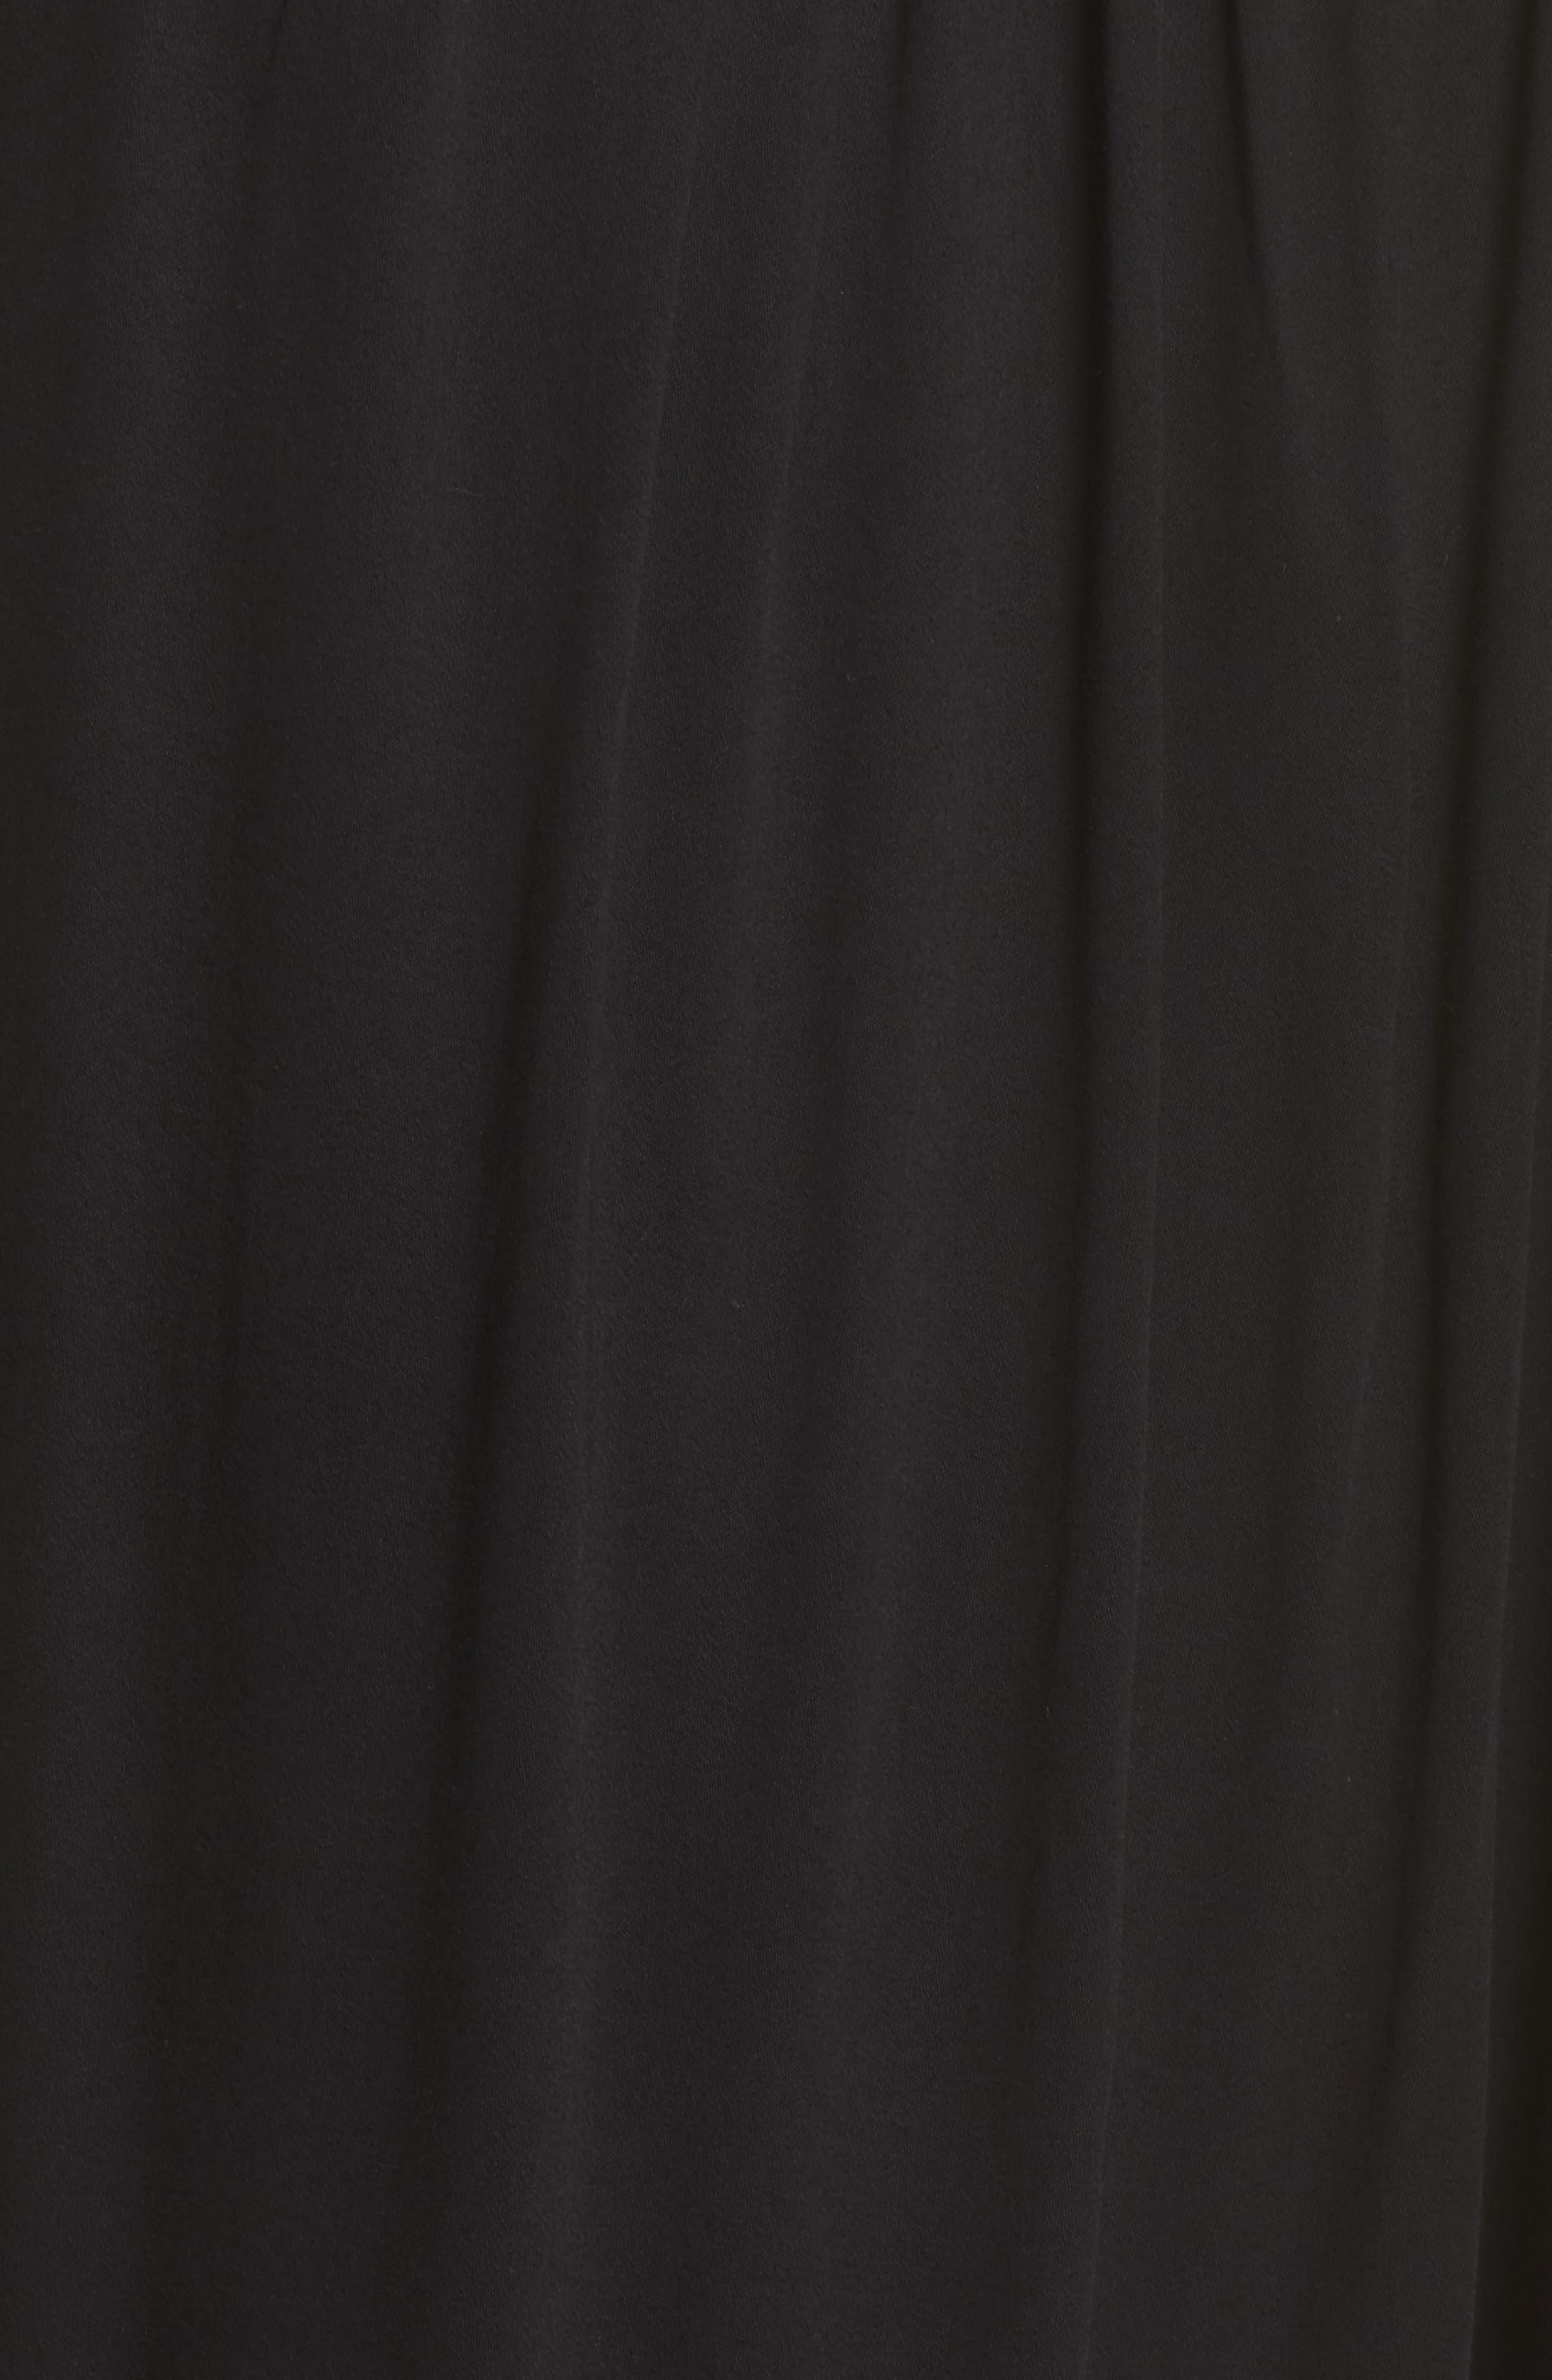 California Core Pali Wrap Cover-Up Dress,                             Alternate thumbnail 5, color,                             Black